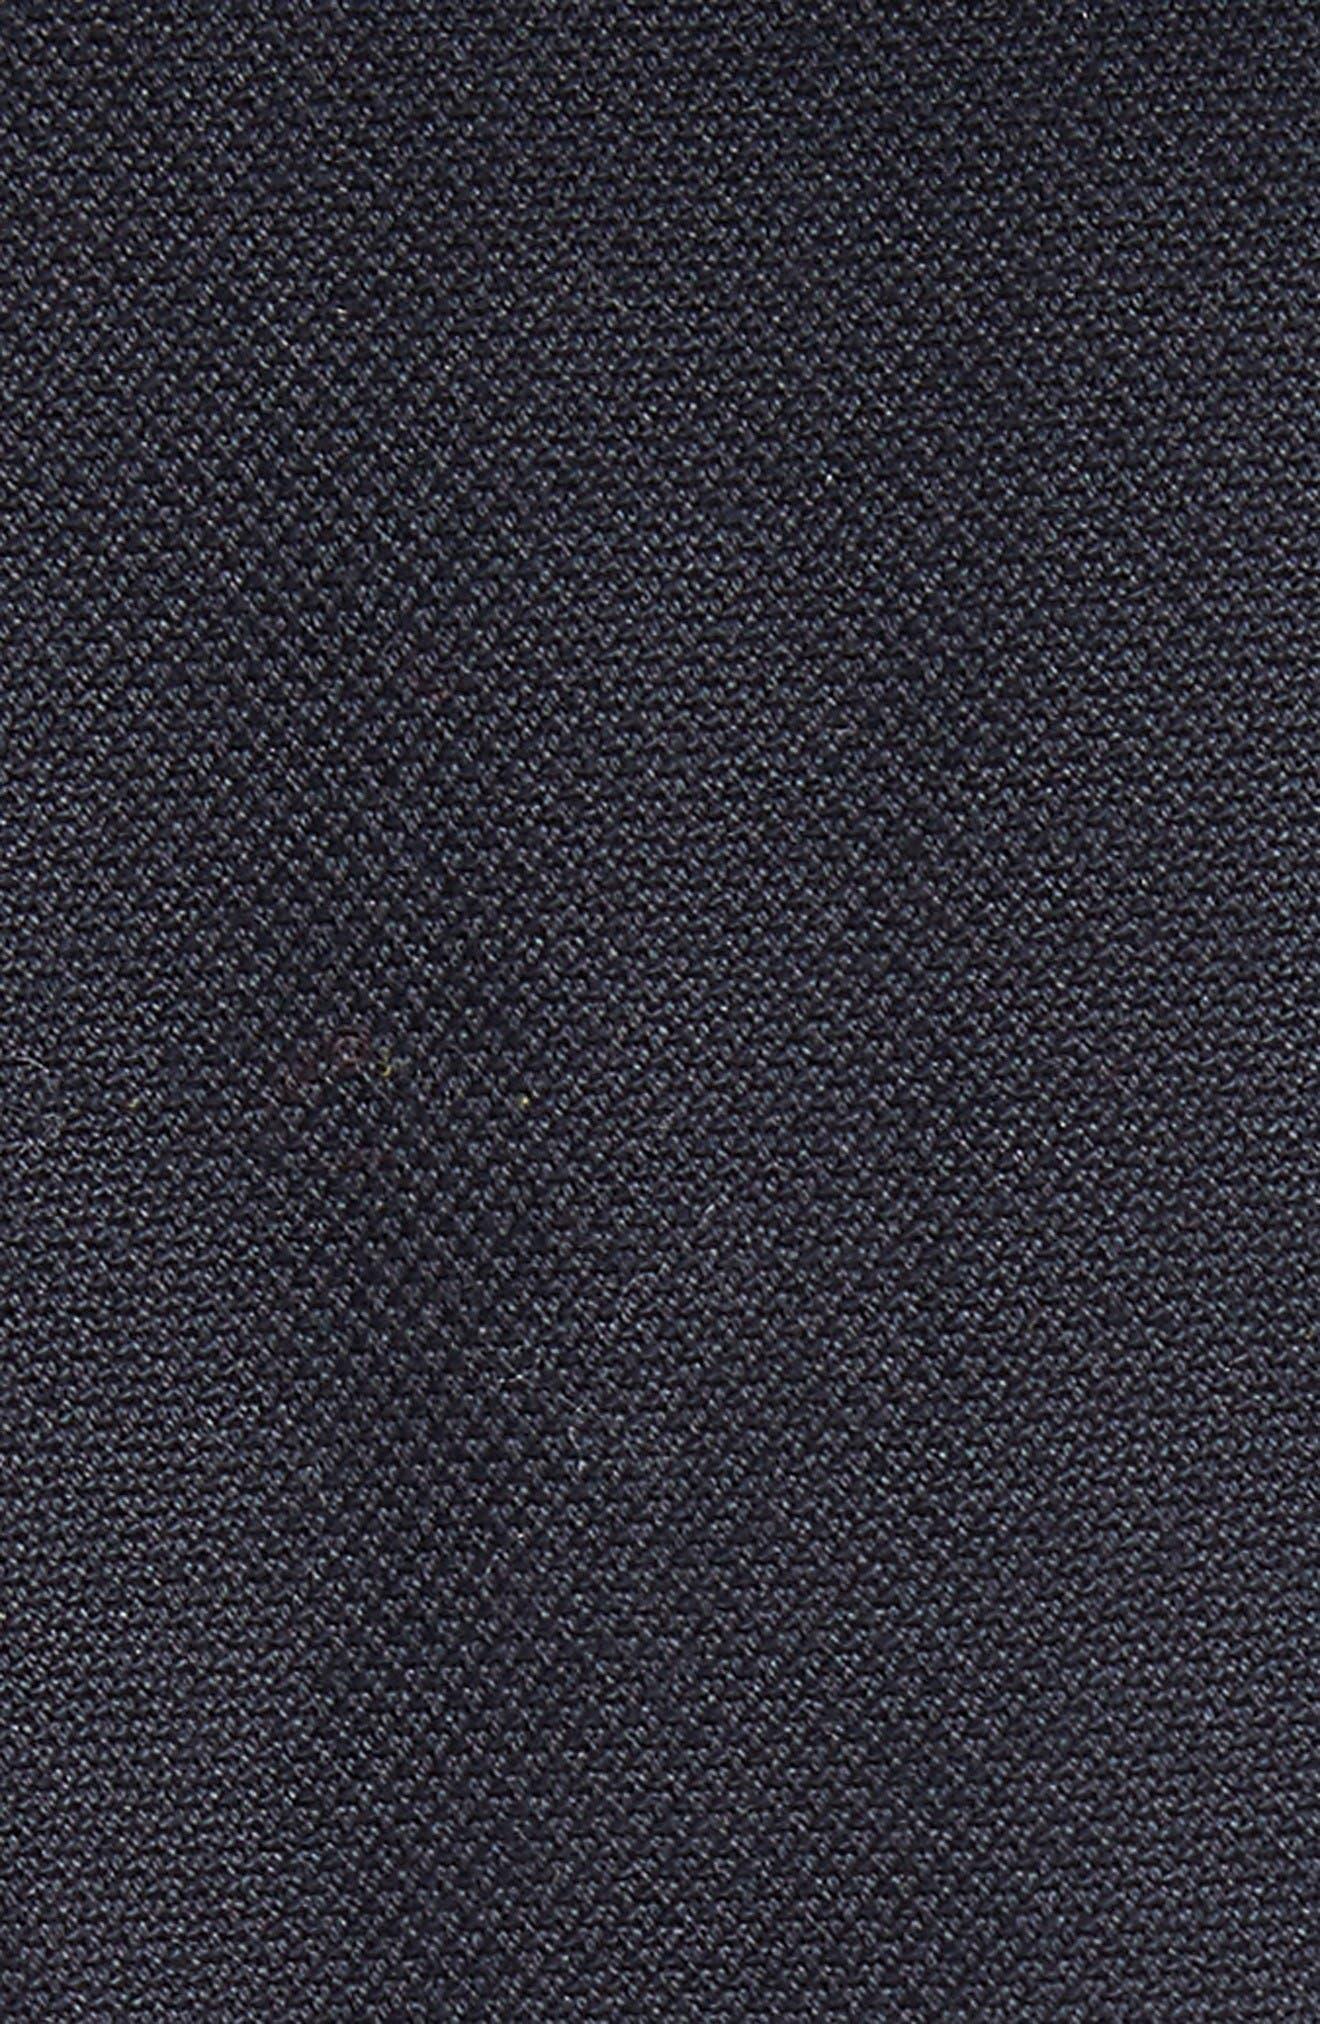 Alternate Image 3  - Dolce&Gabbana Piqué Cotton Crop Jacket